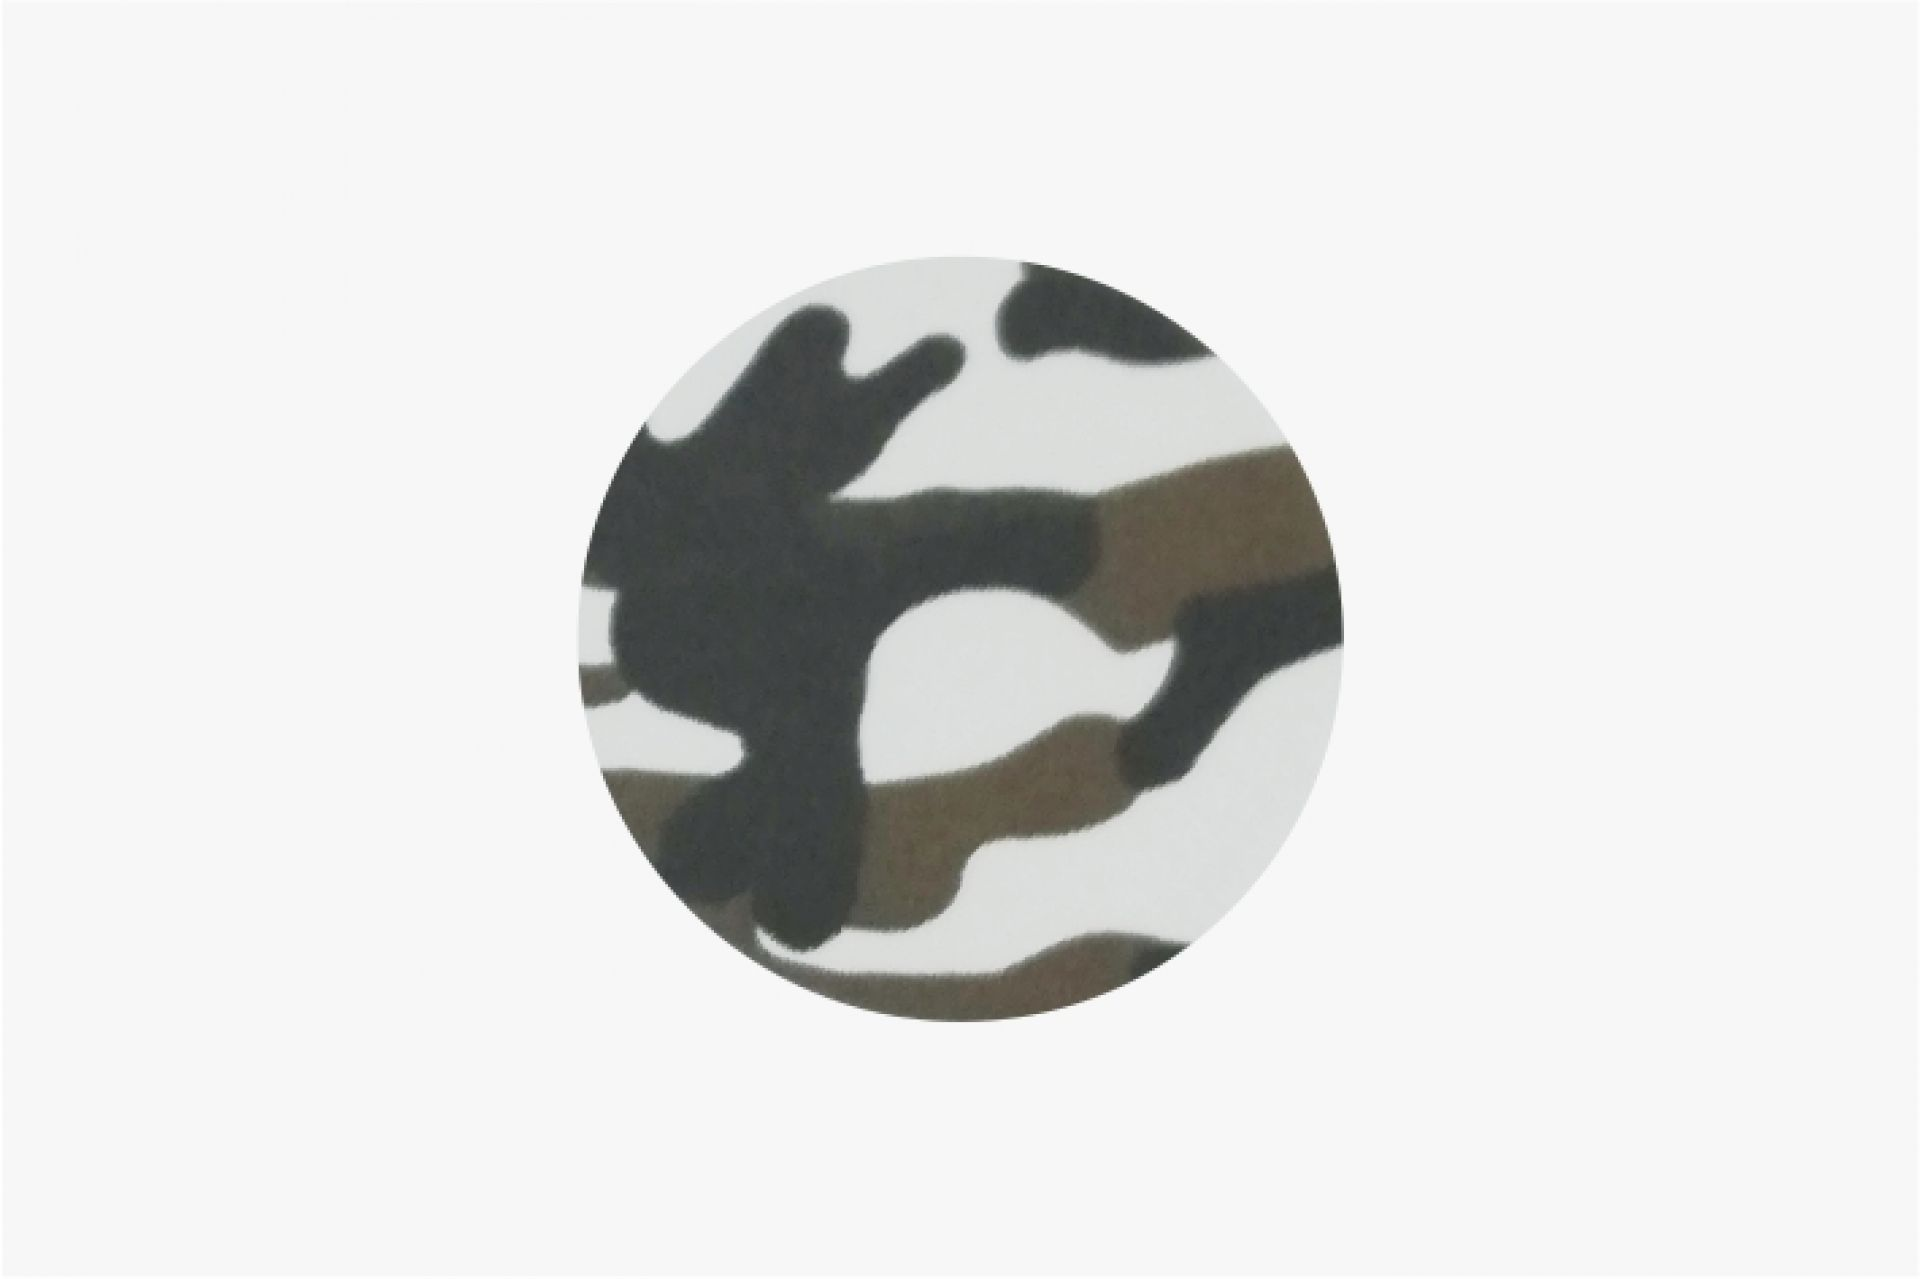 SOFT PU, SLP-04 OLIVE CAMO